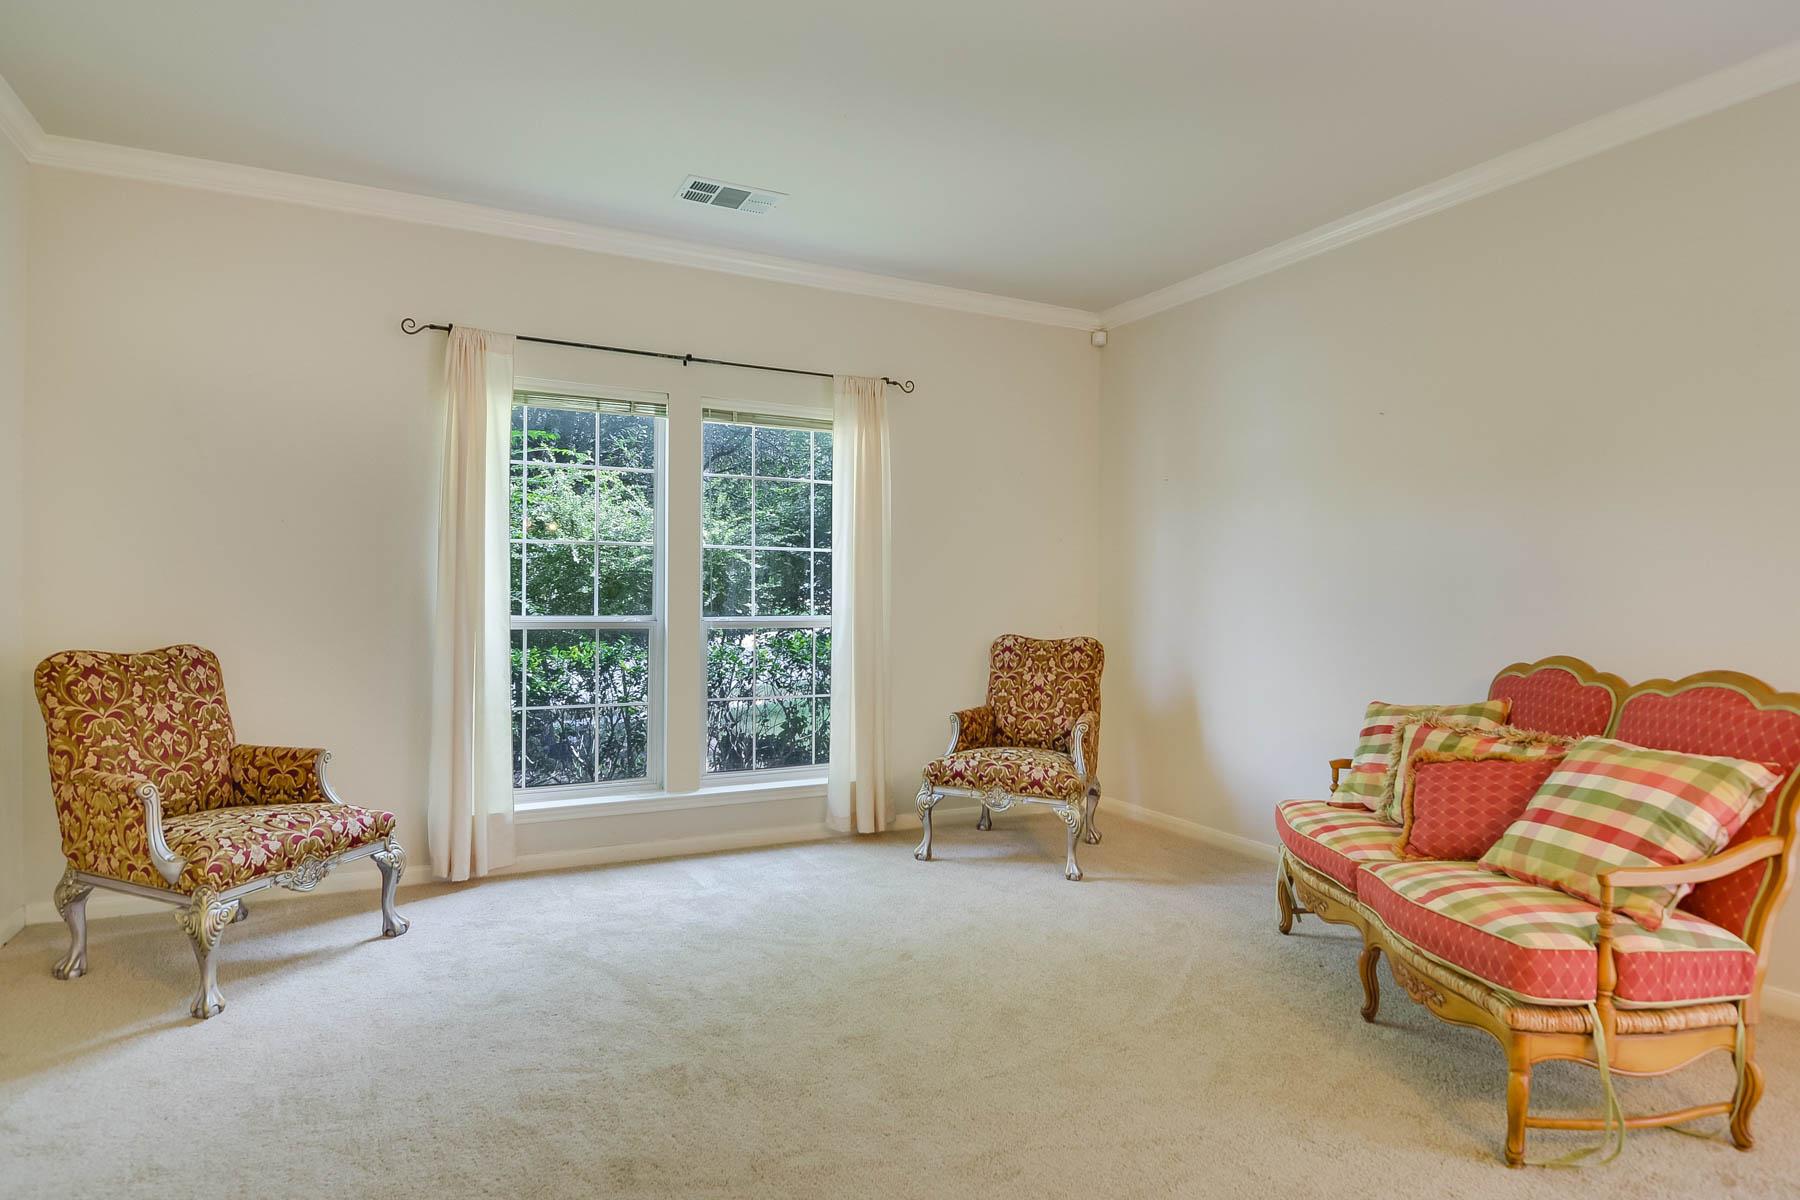 Additional photo for property listing at Warm and Inviting Home in Santa Fe Trail 1702 Santa Fe Trl San Antonio, Texas 78232 Estados Unidos